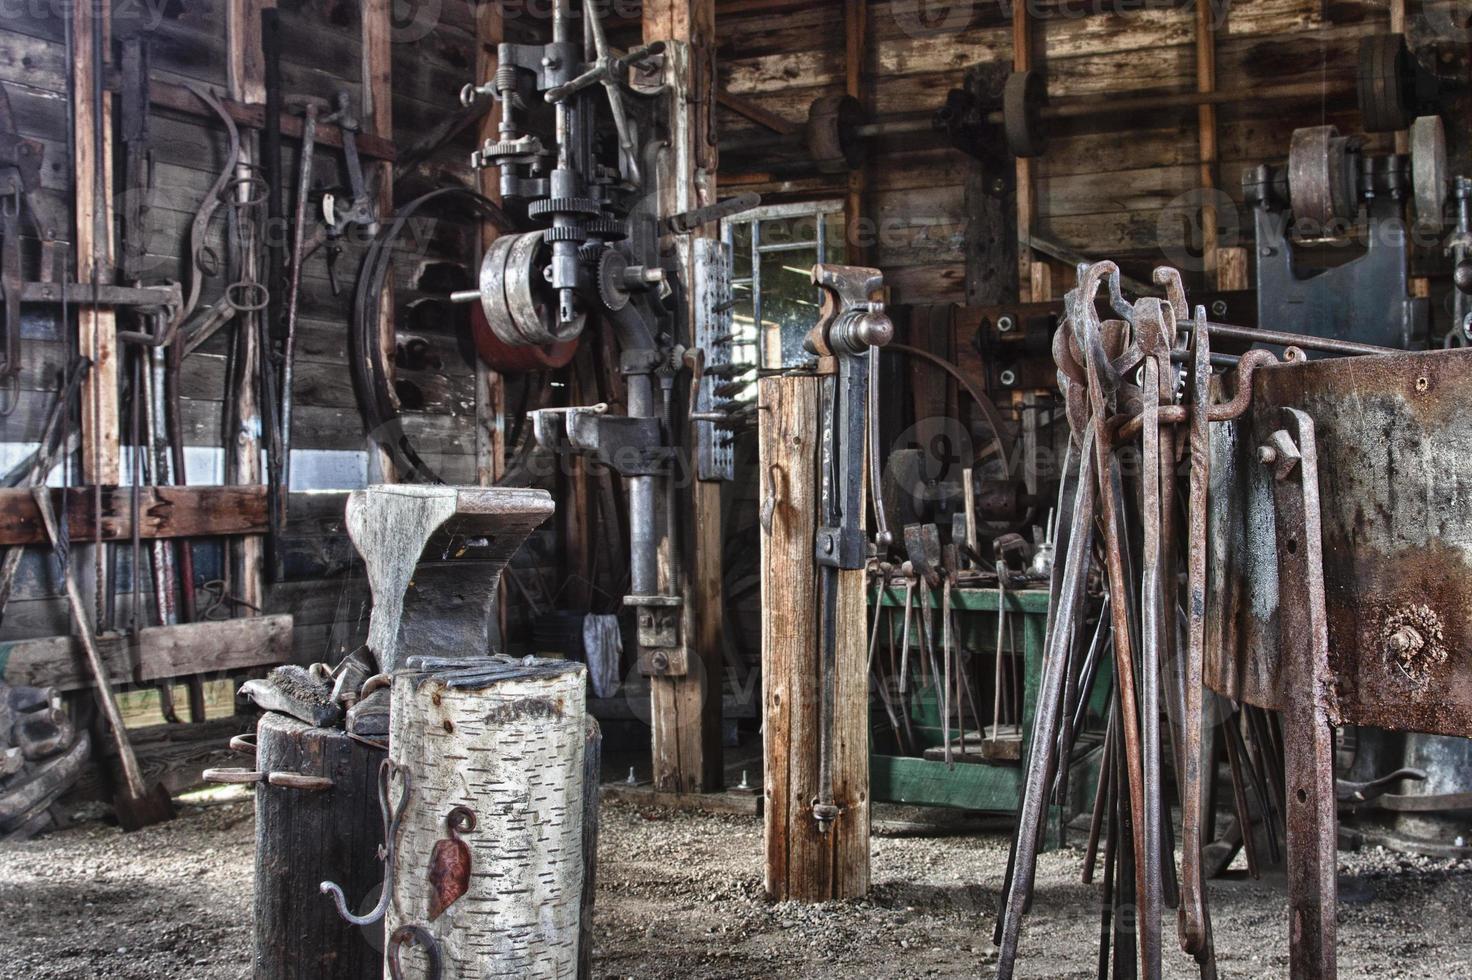 ferramentas de ferreiro foto